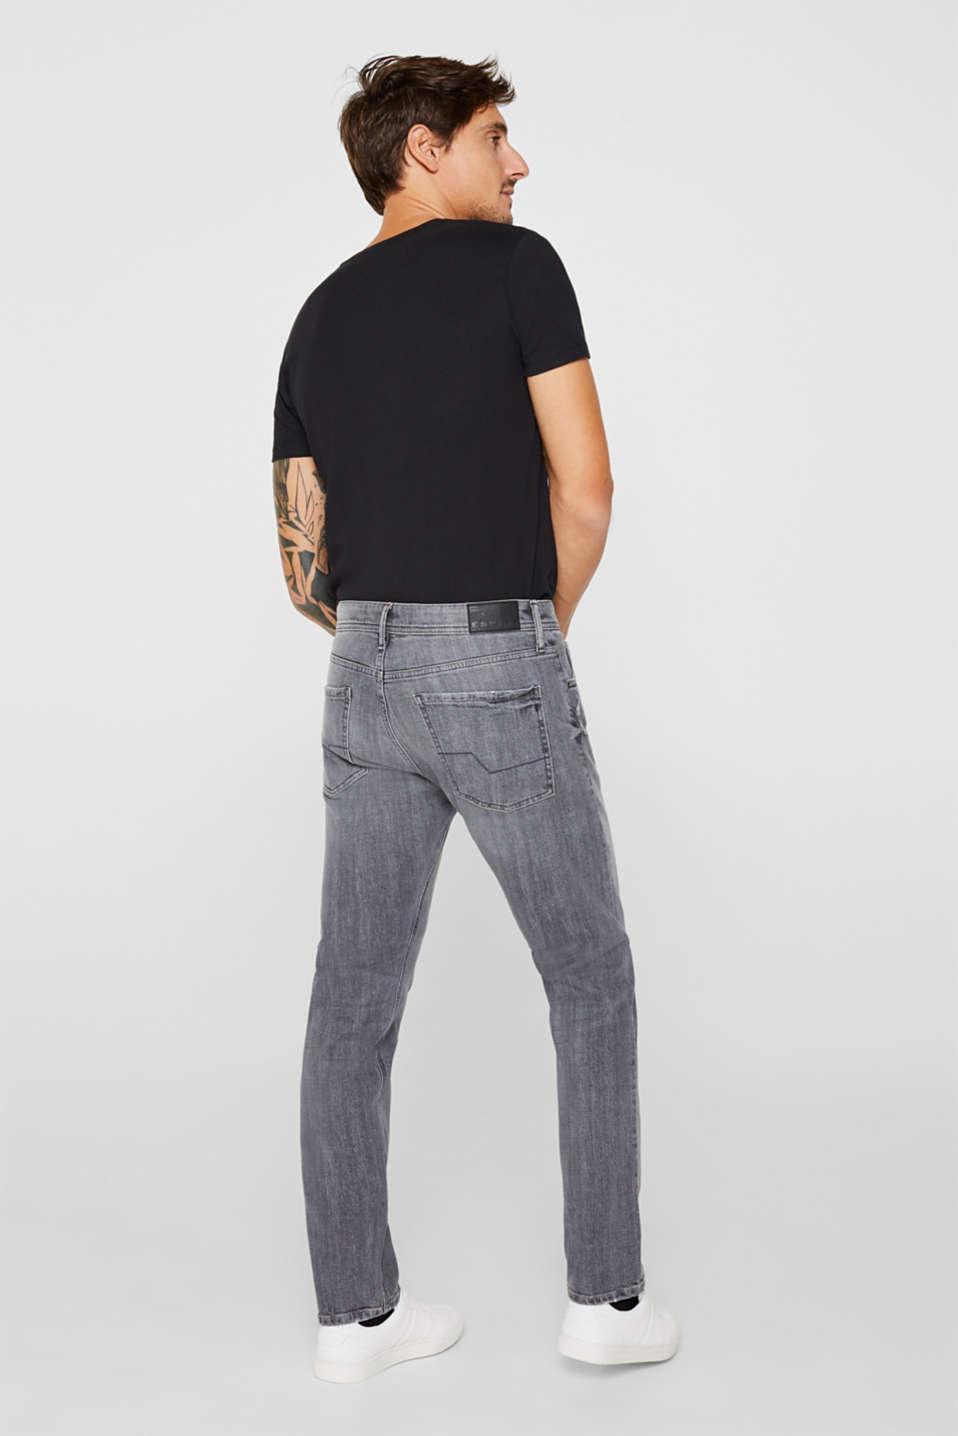 Pants denim, GREY MEDIUM WASH, detail image number 1